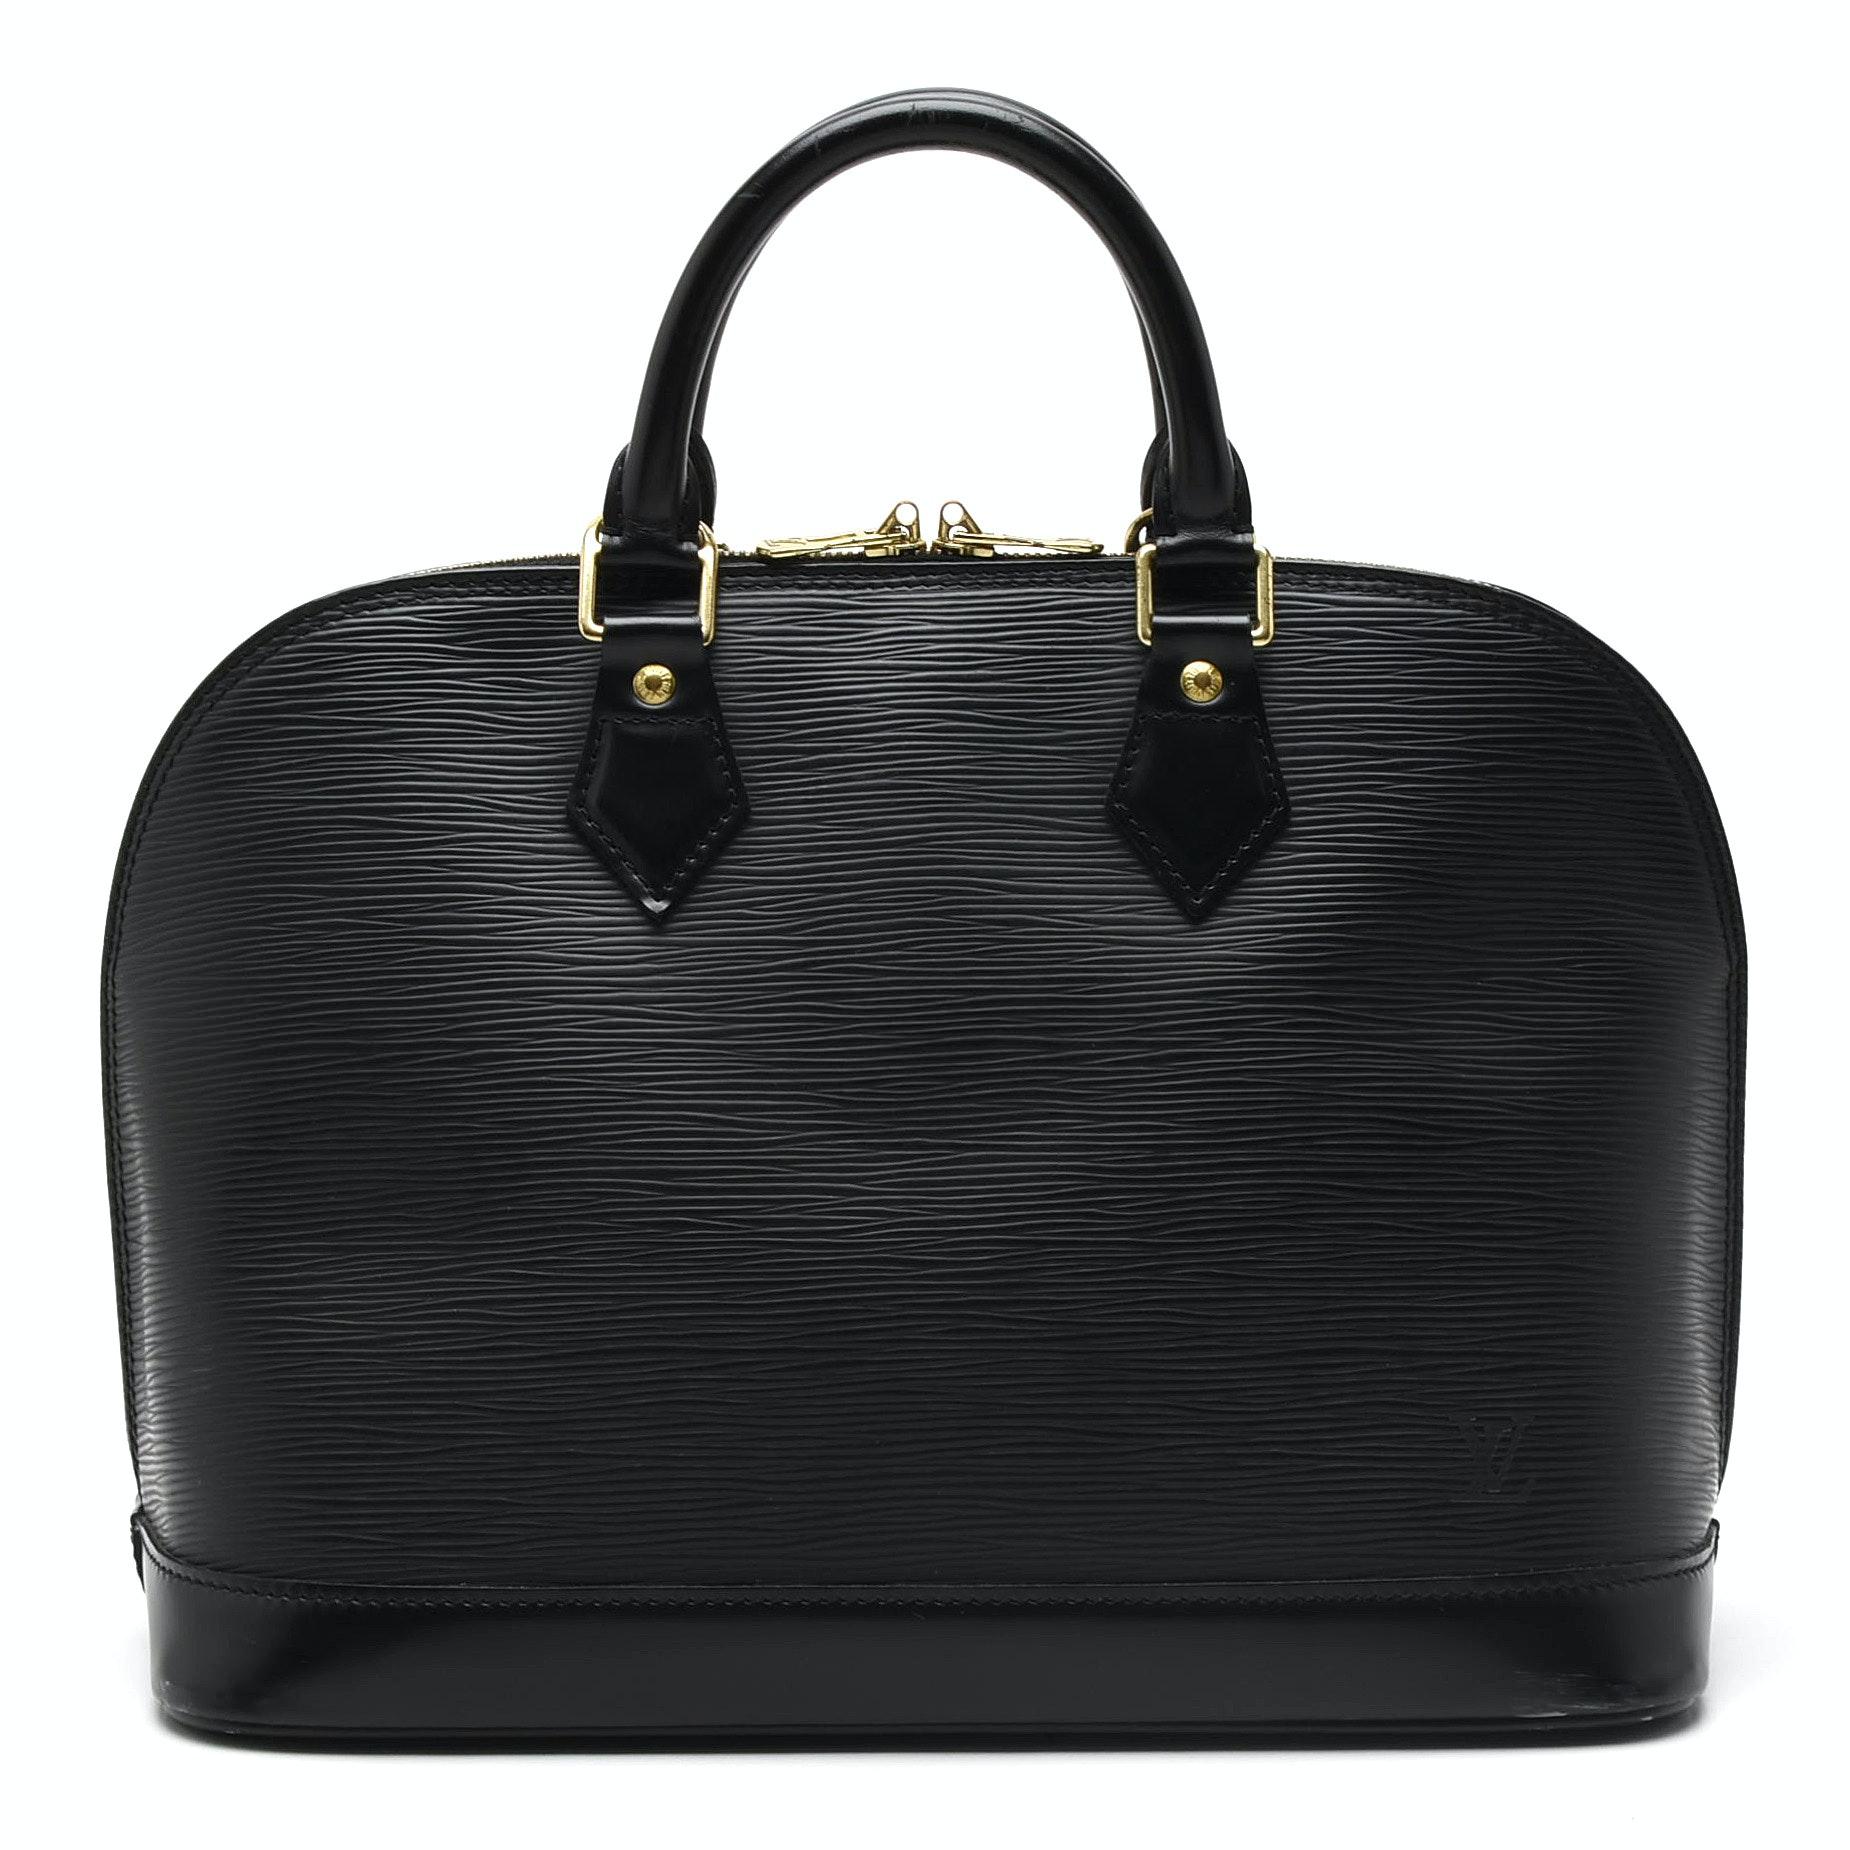 2001 Louis Vuitton Alma PM Black EPI Leather Handbag